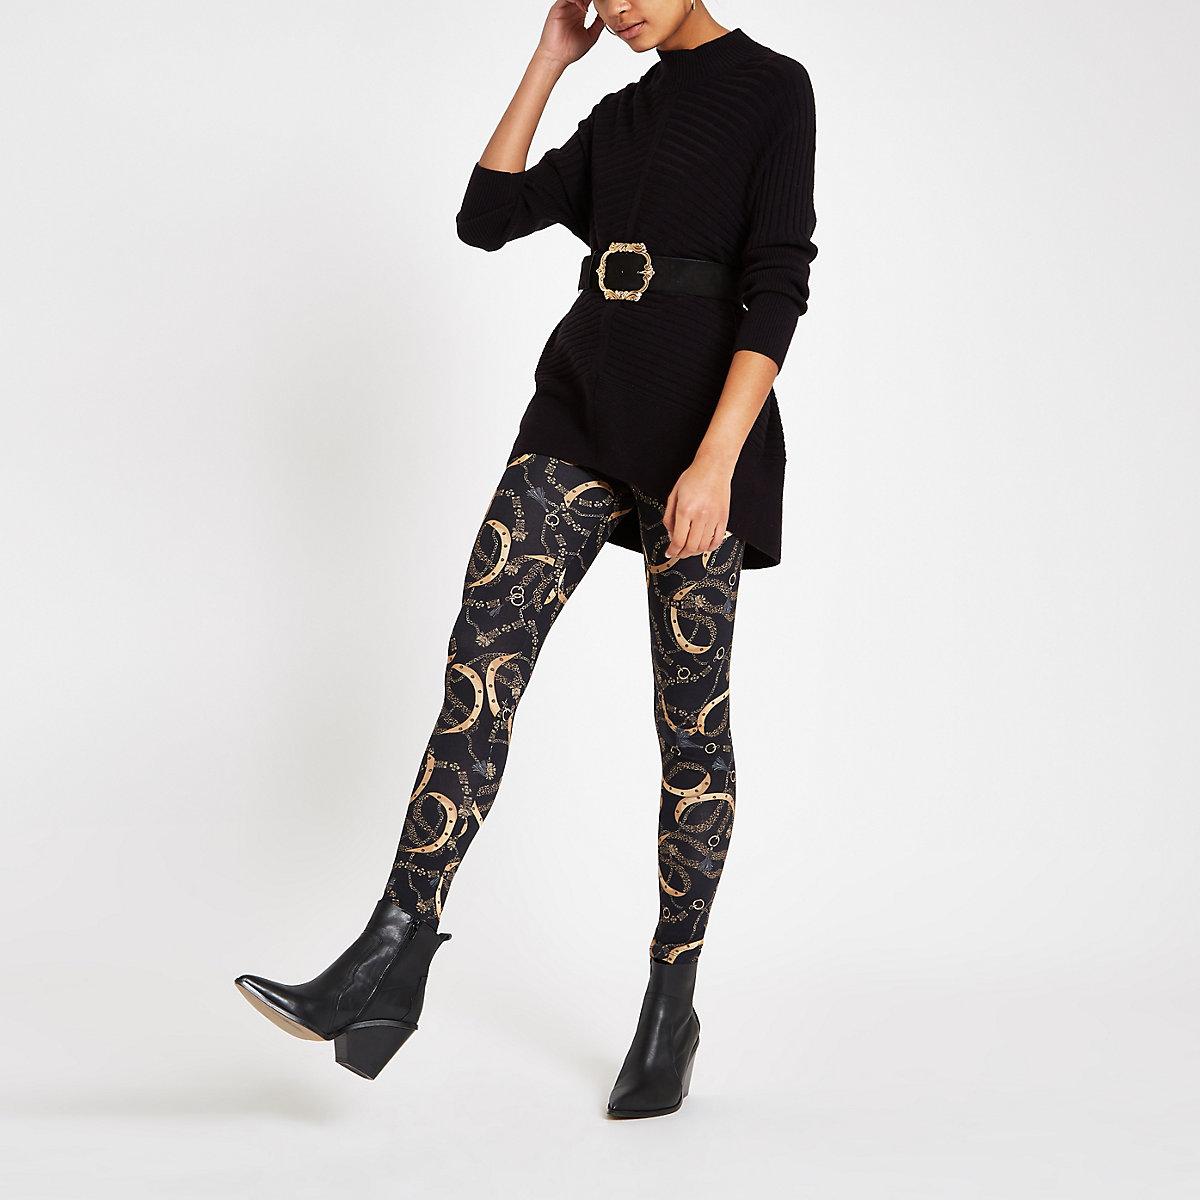 Black chain print leggings